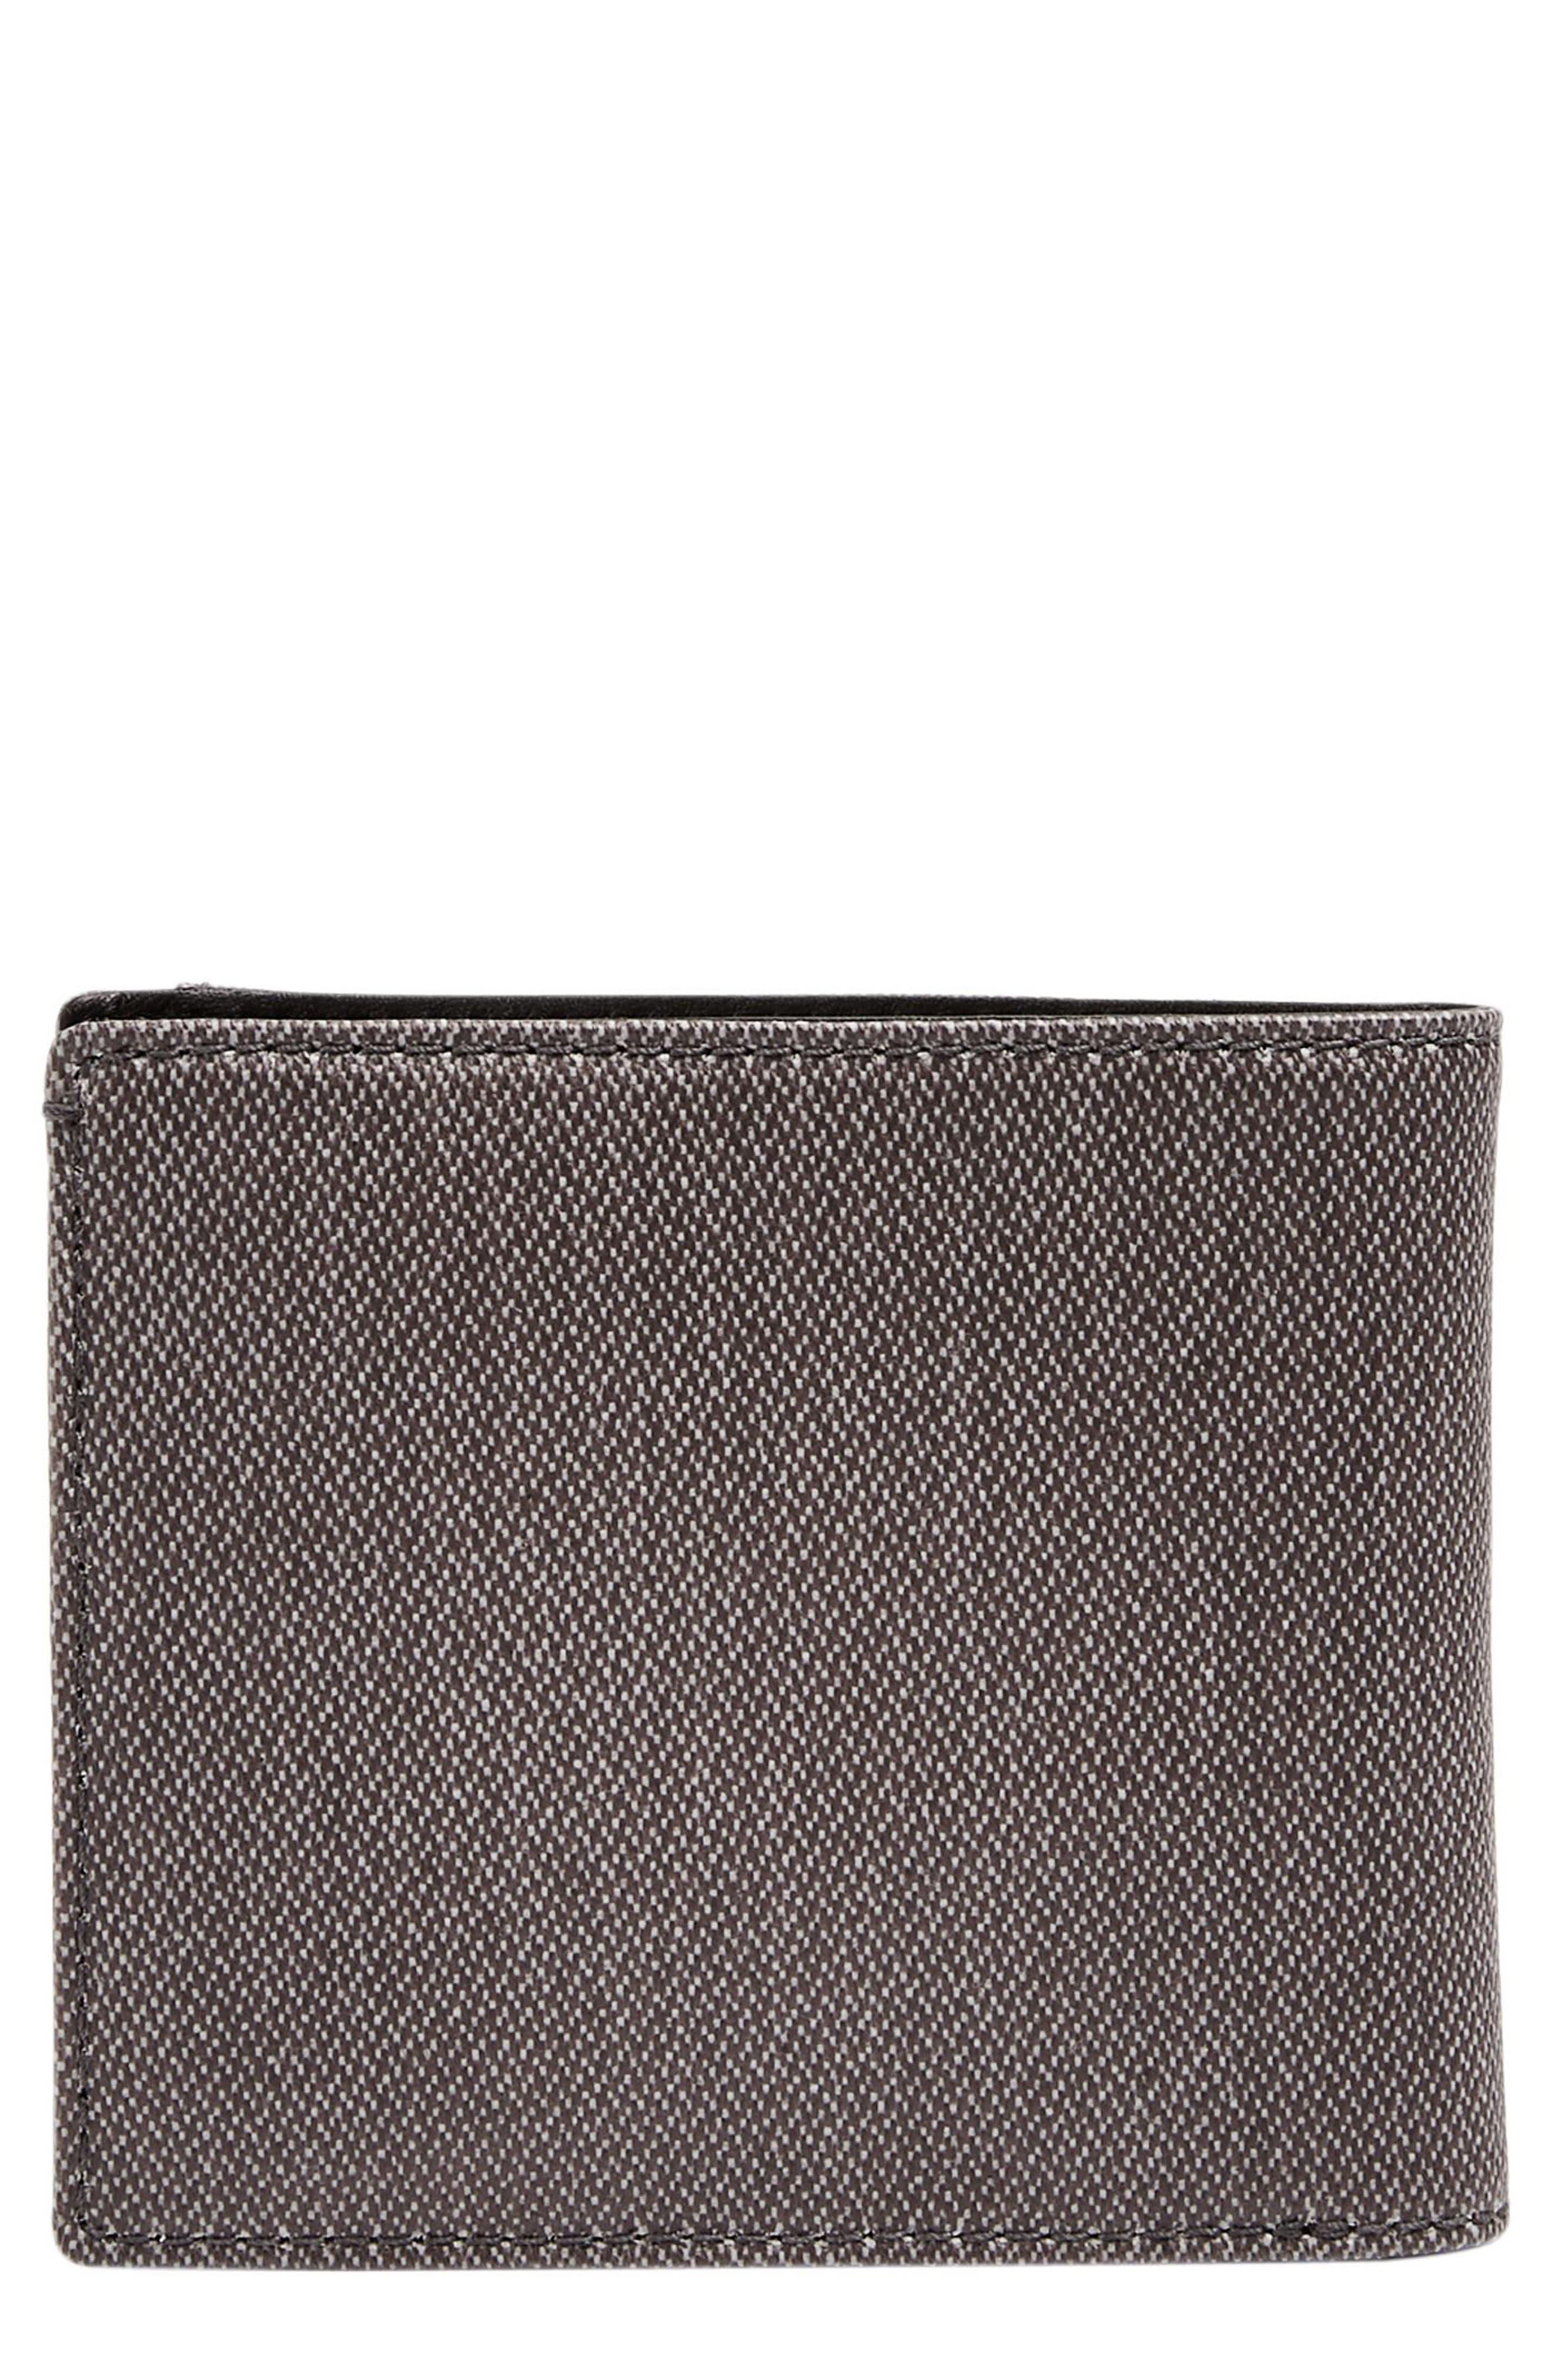 Alternate Image 1 Selected - Skagen Passcase Wallet